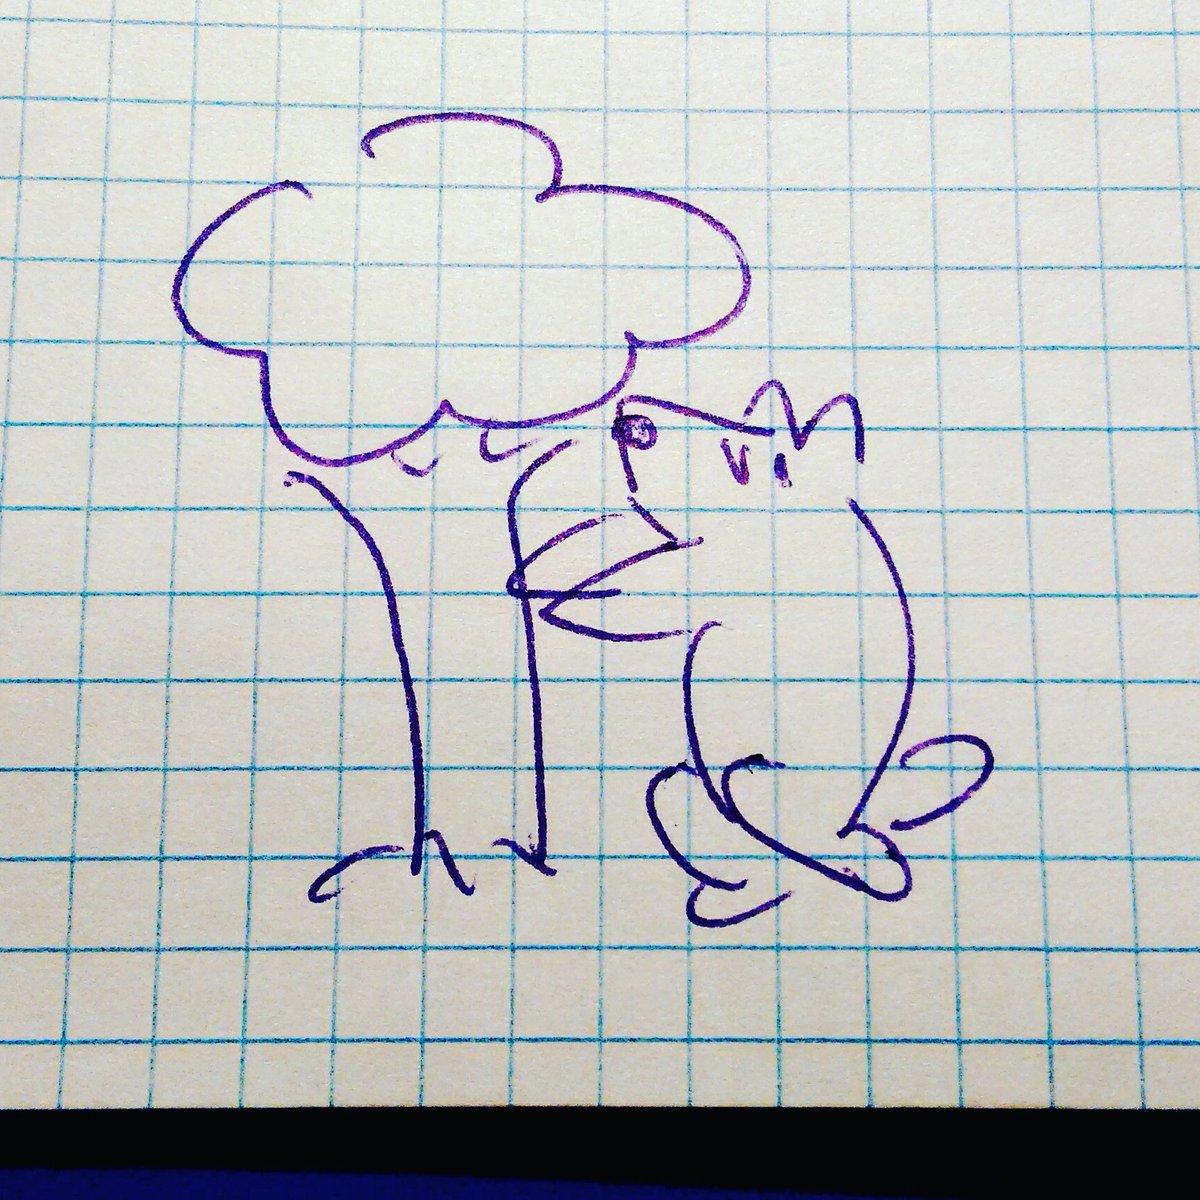 Creo que podría dedicarme a esto profesionalmente  #arte #monigotes <br>http://pic.twitter.com/v4Go221bAS